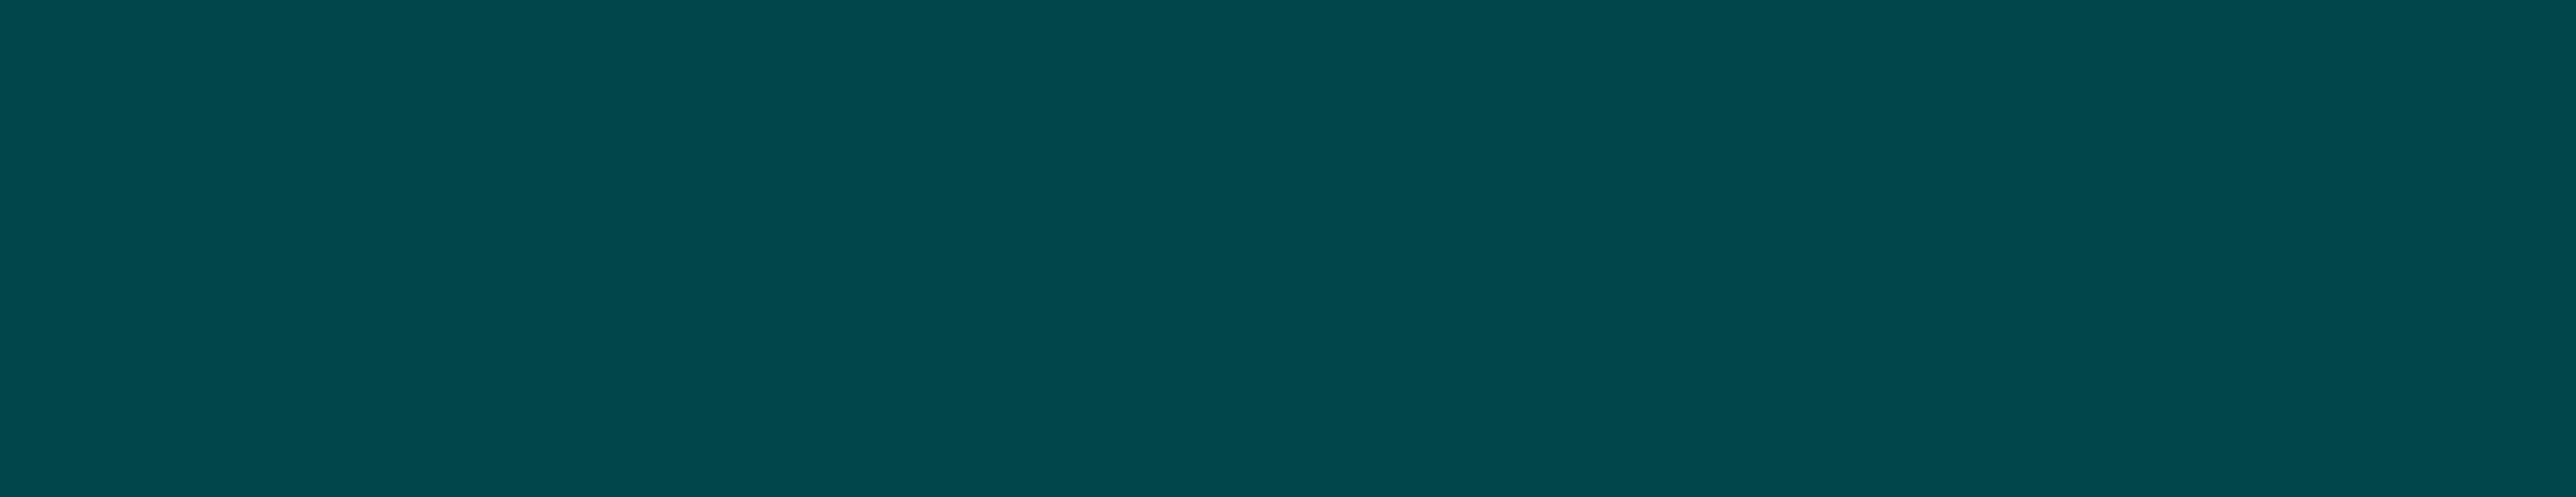 BioInnovation Institute logo